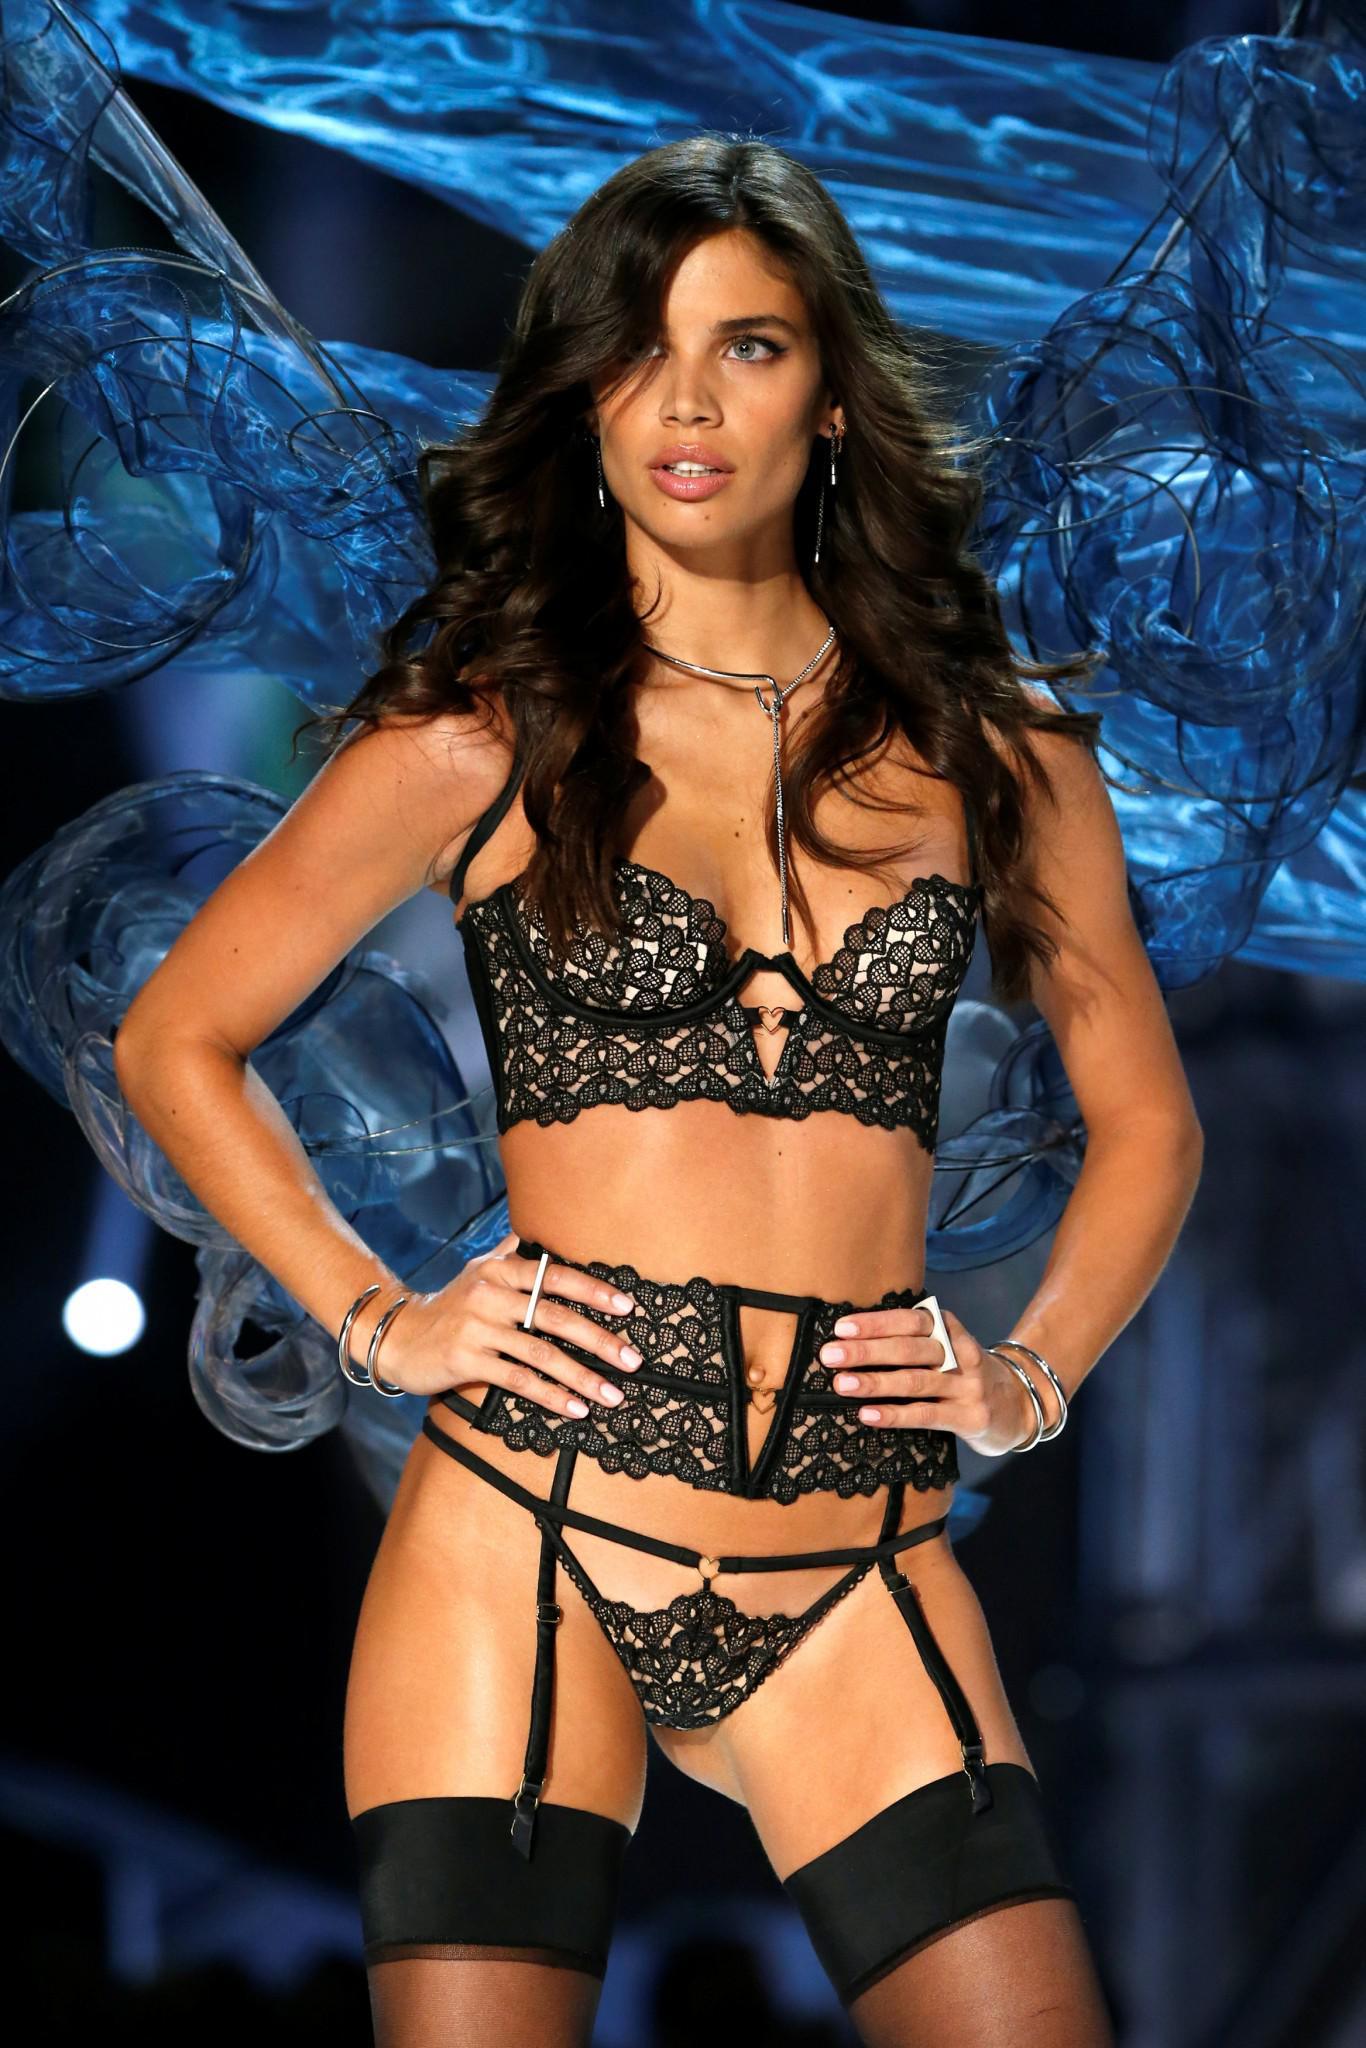 Victoria-Secret-show-esorouxa-modela-1300-4 Το show της Victoria's Secret που «κόλασε» το Παρίσι με τα αγγελάκια της